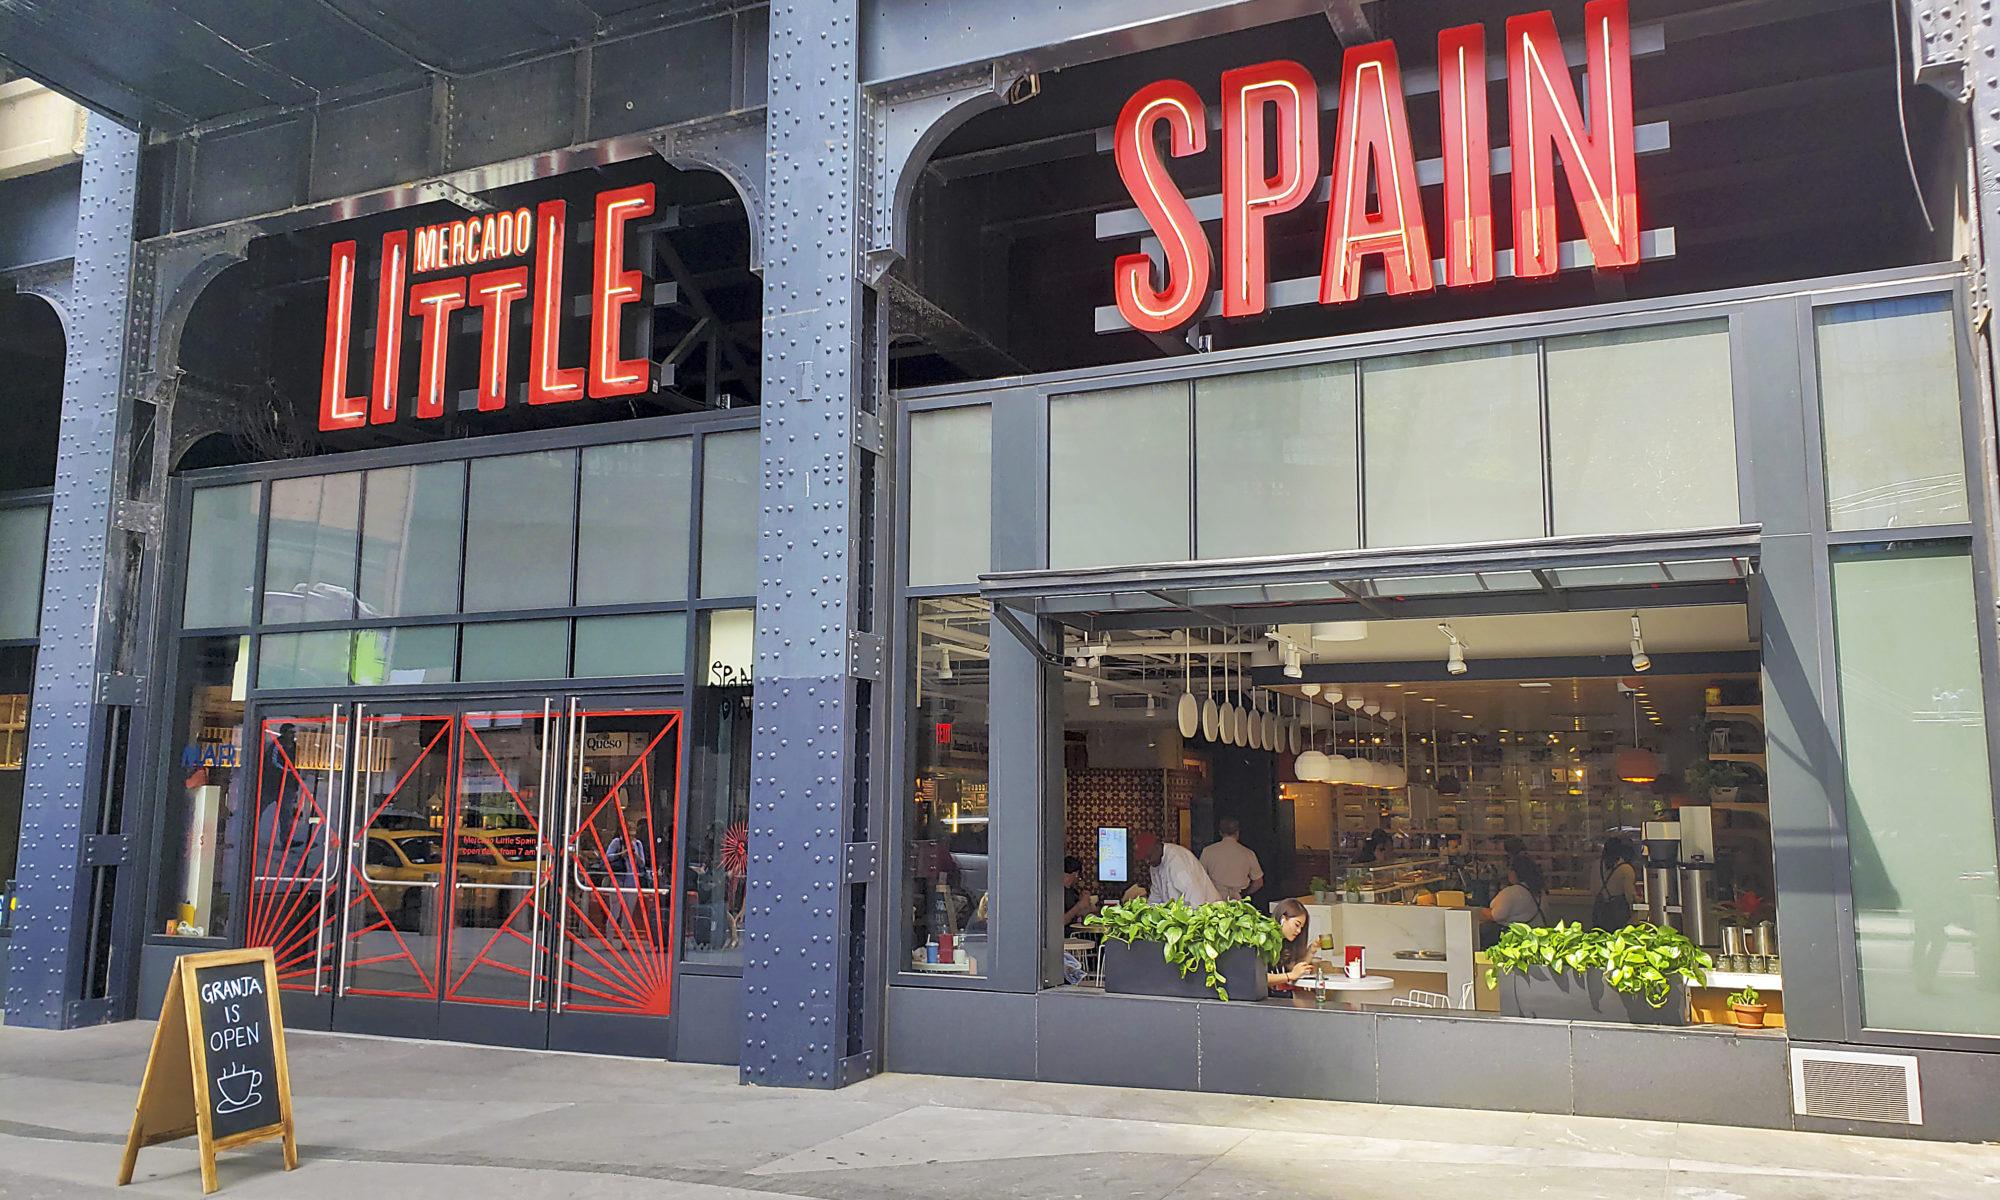 Entrance to Mercado Little Spain on 30th street